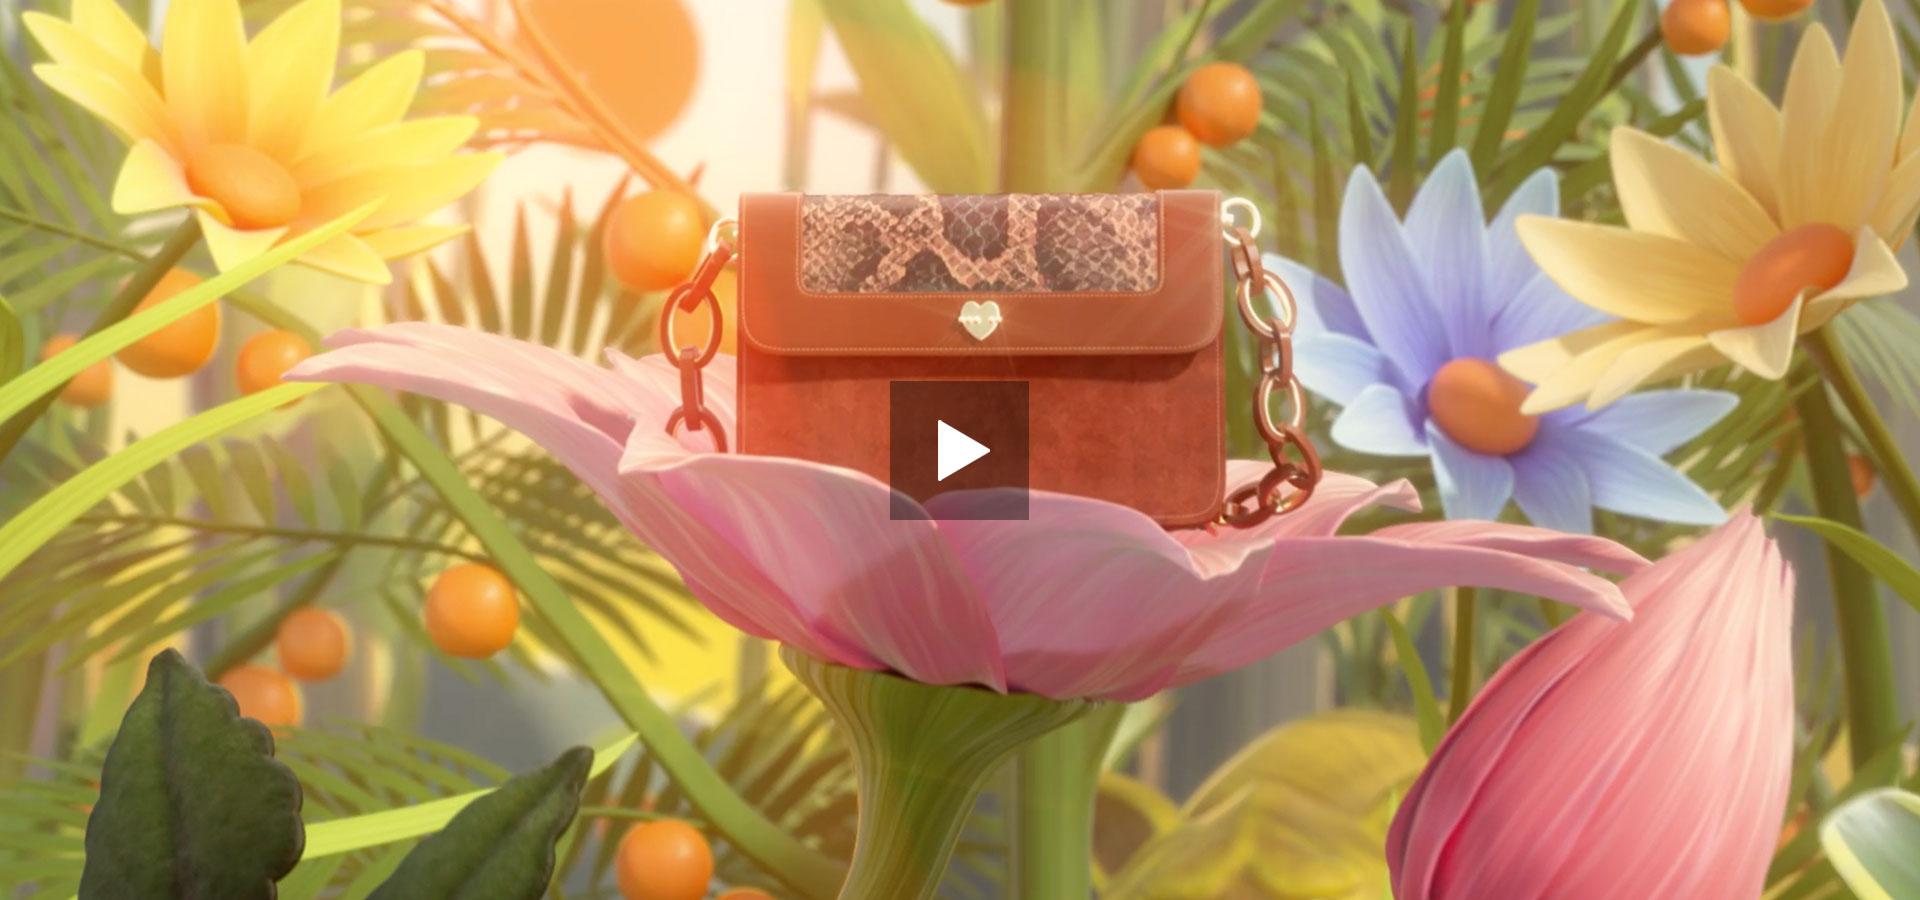 Motivi - Iconic Bag - Fashion Meets Art - Motion Graphics - Digital Compaign - 3d - Milano